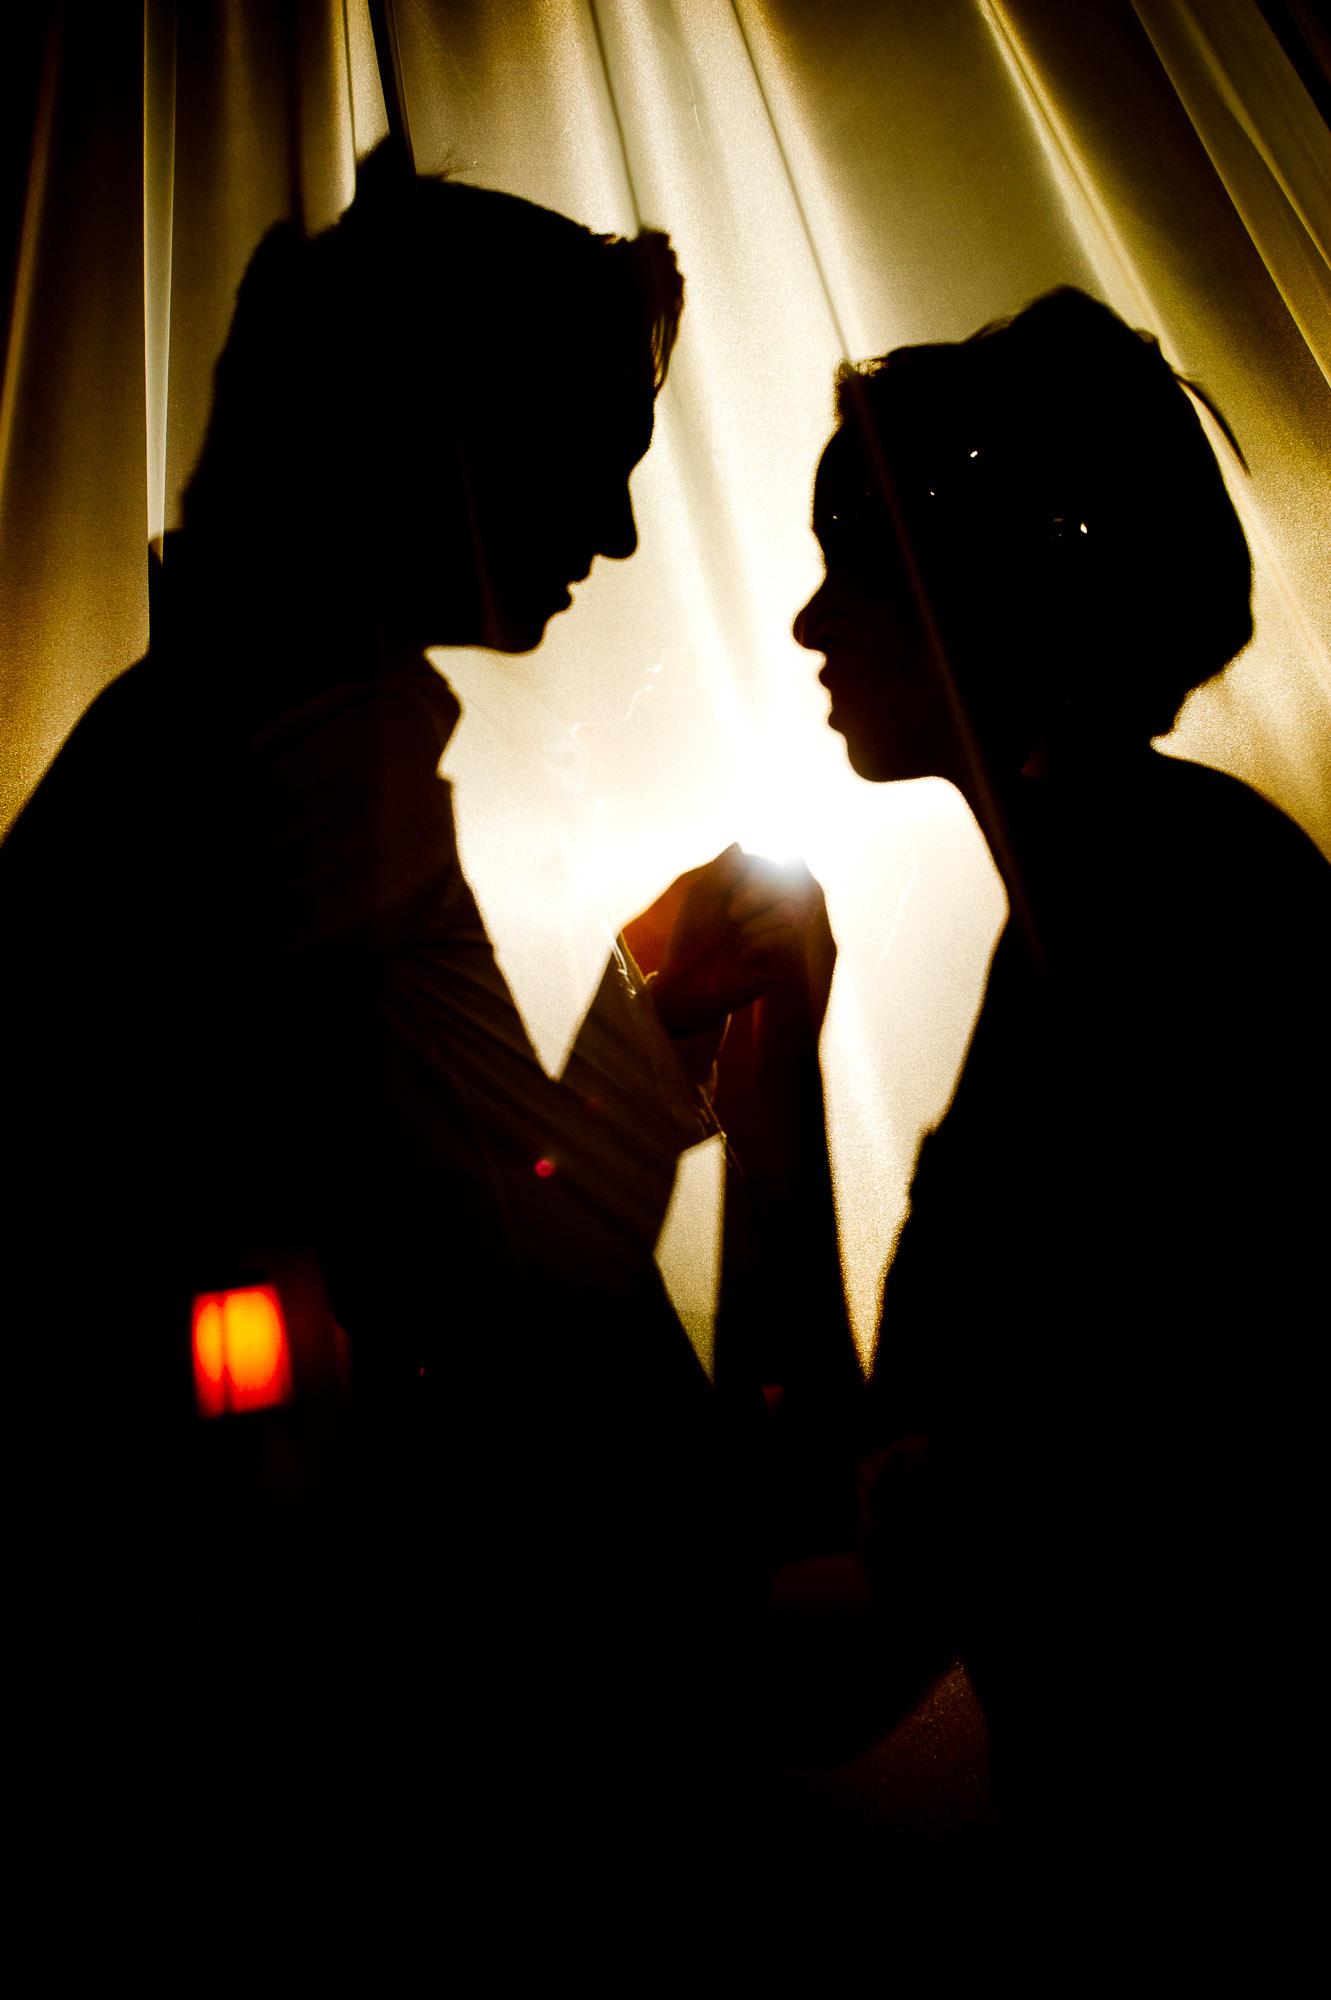 Hua Hin Wedding Photography | Hotel V Villas Hua Hin Pre-Wedding Photography